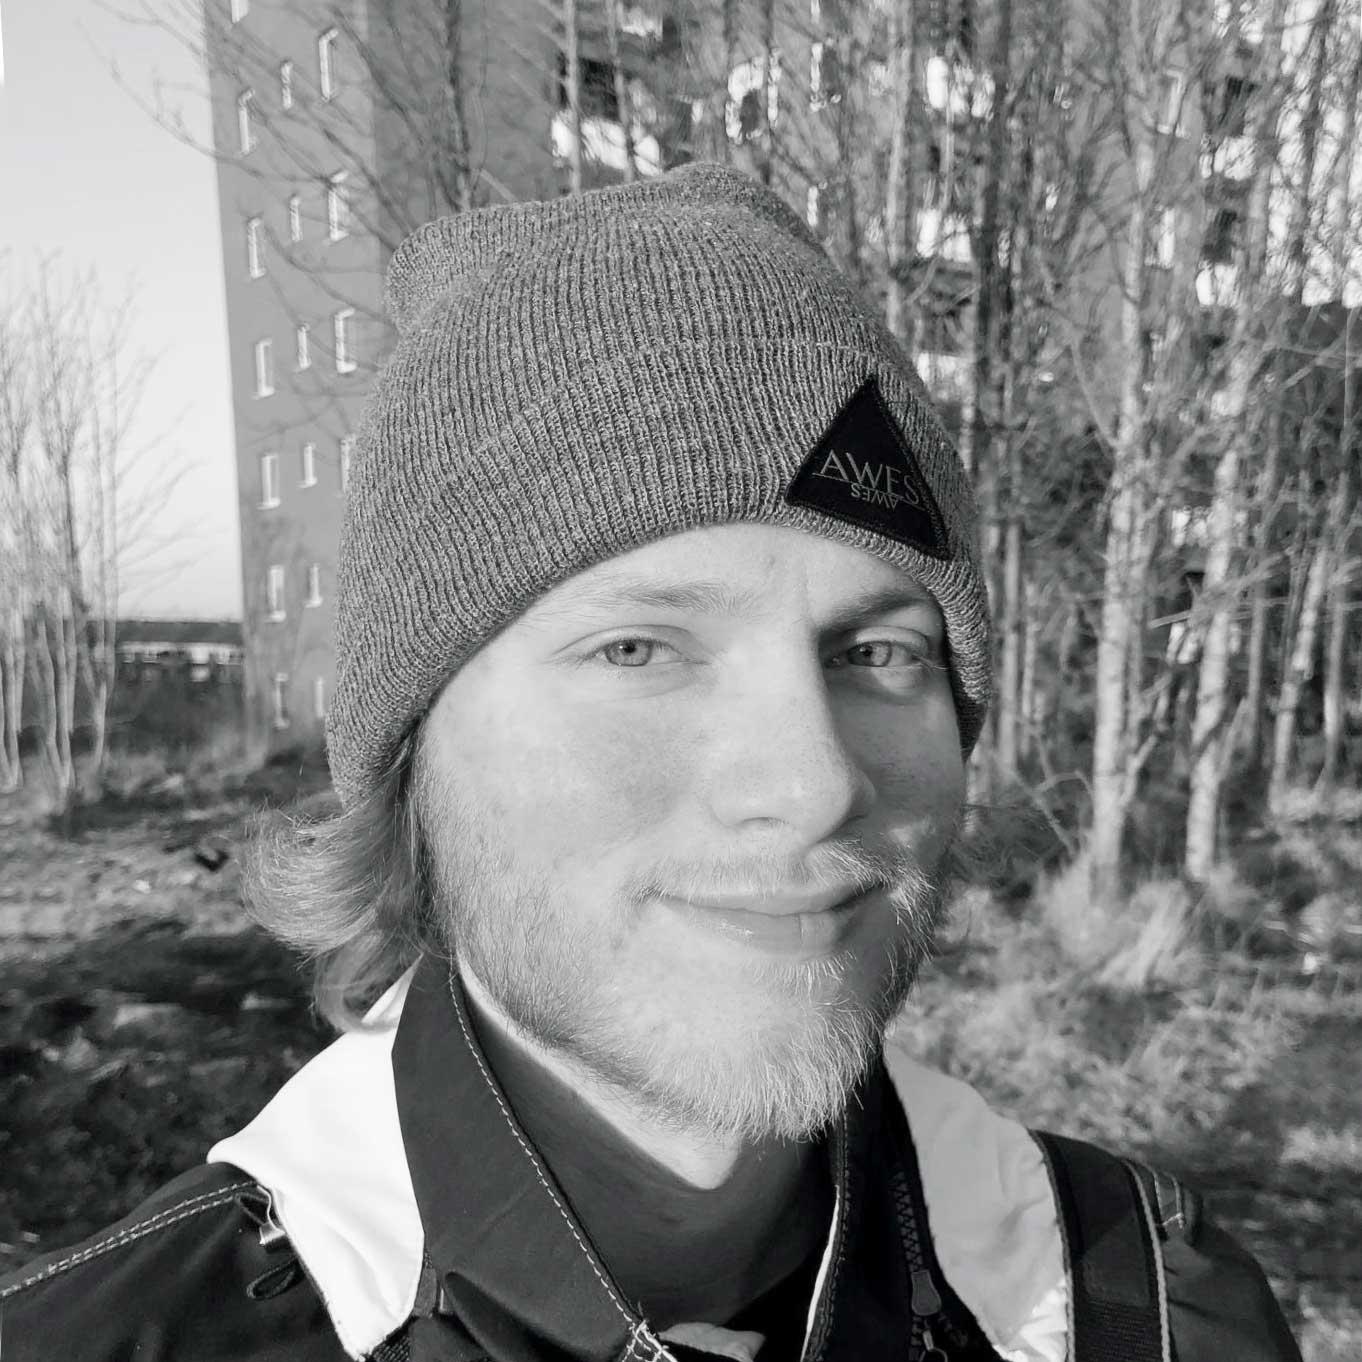 Simon Johannesson